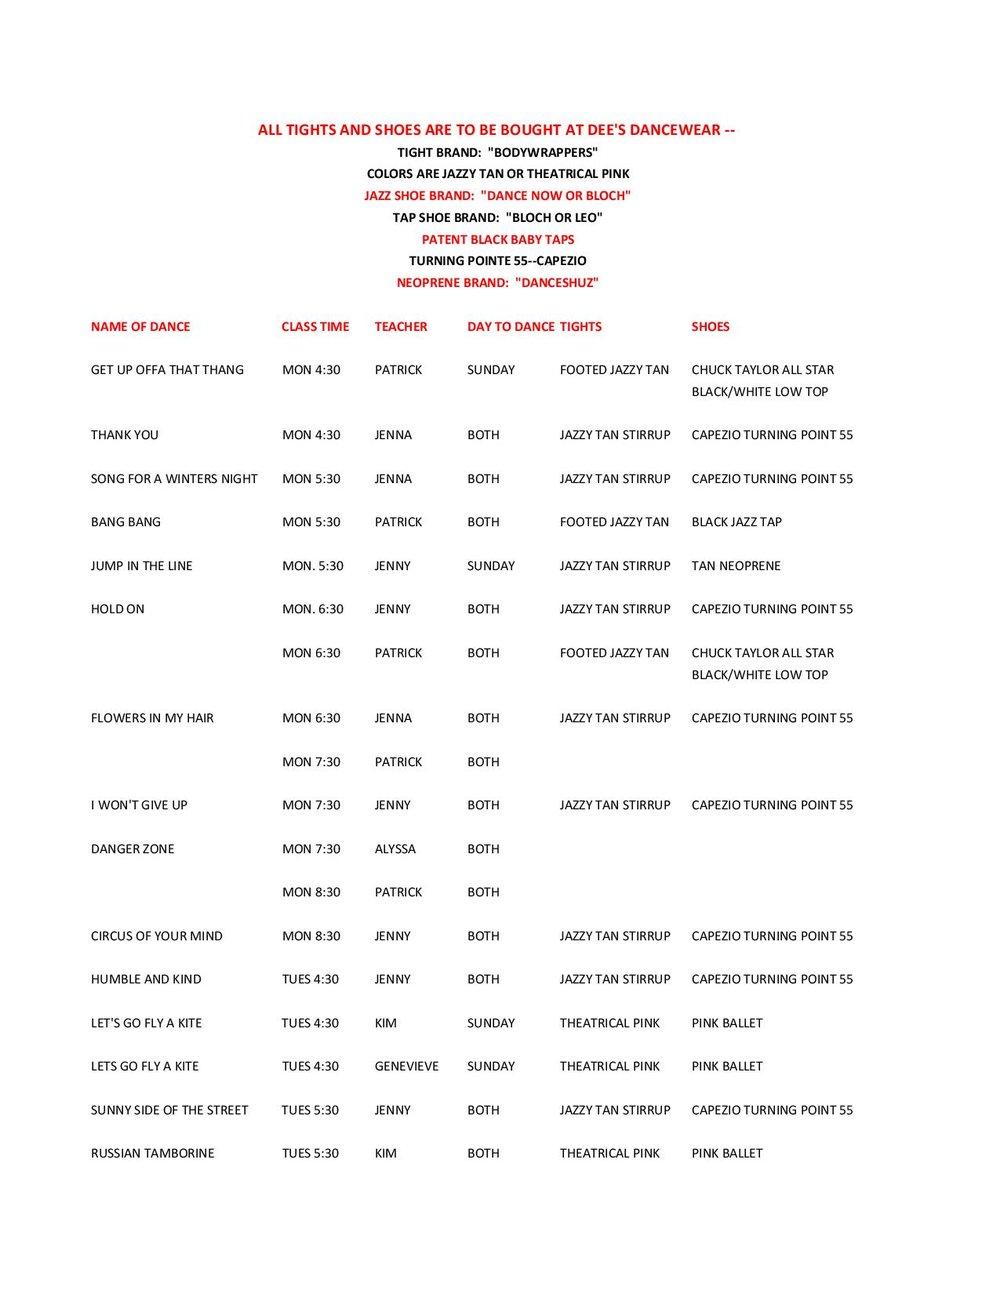 daytodanceweb-page-001.jpg